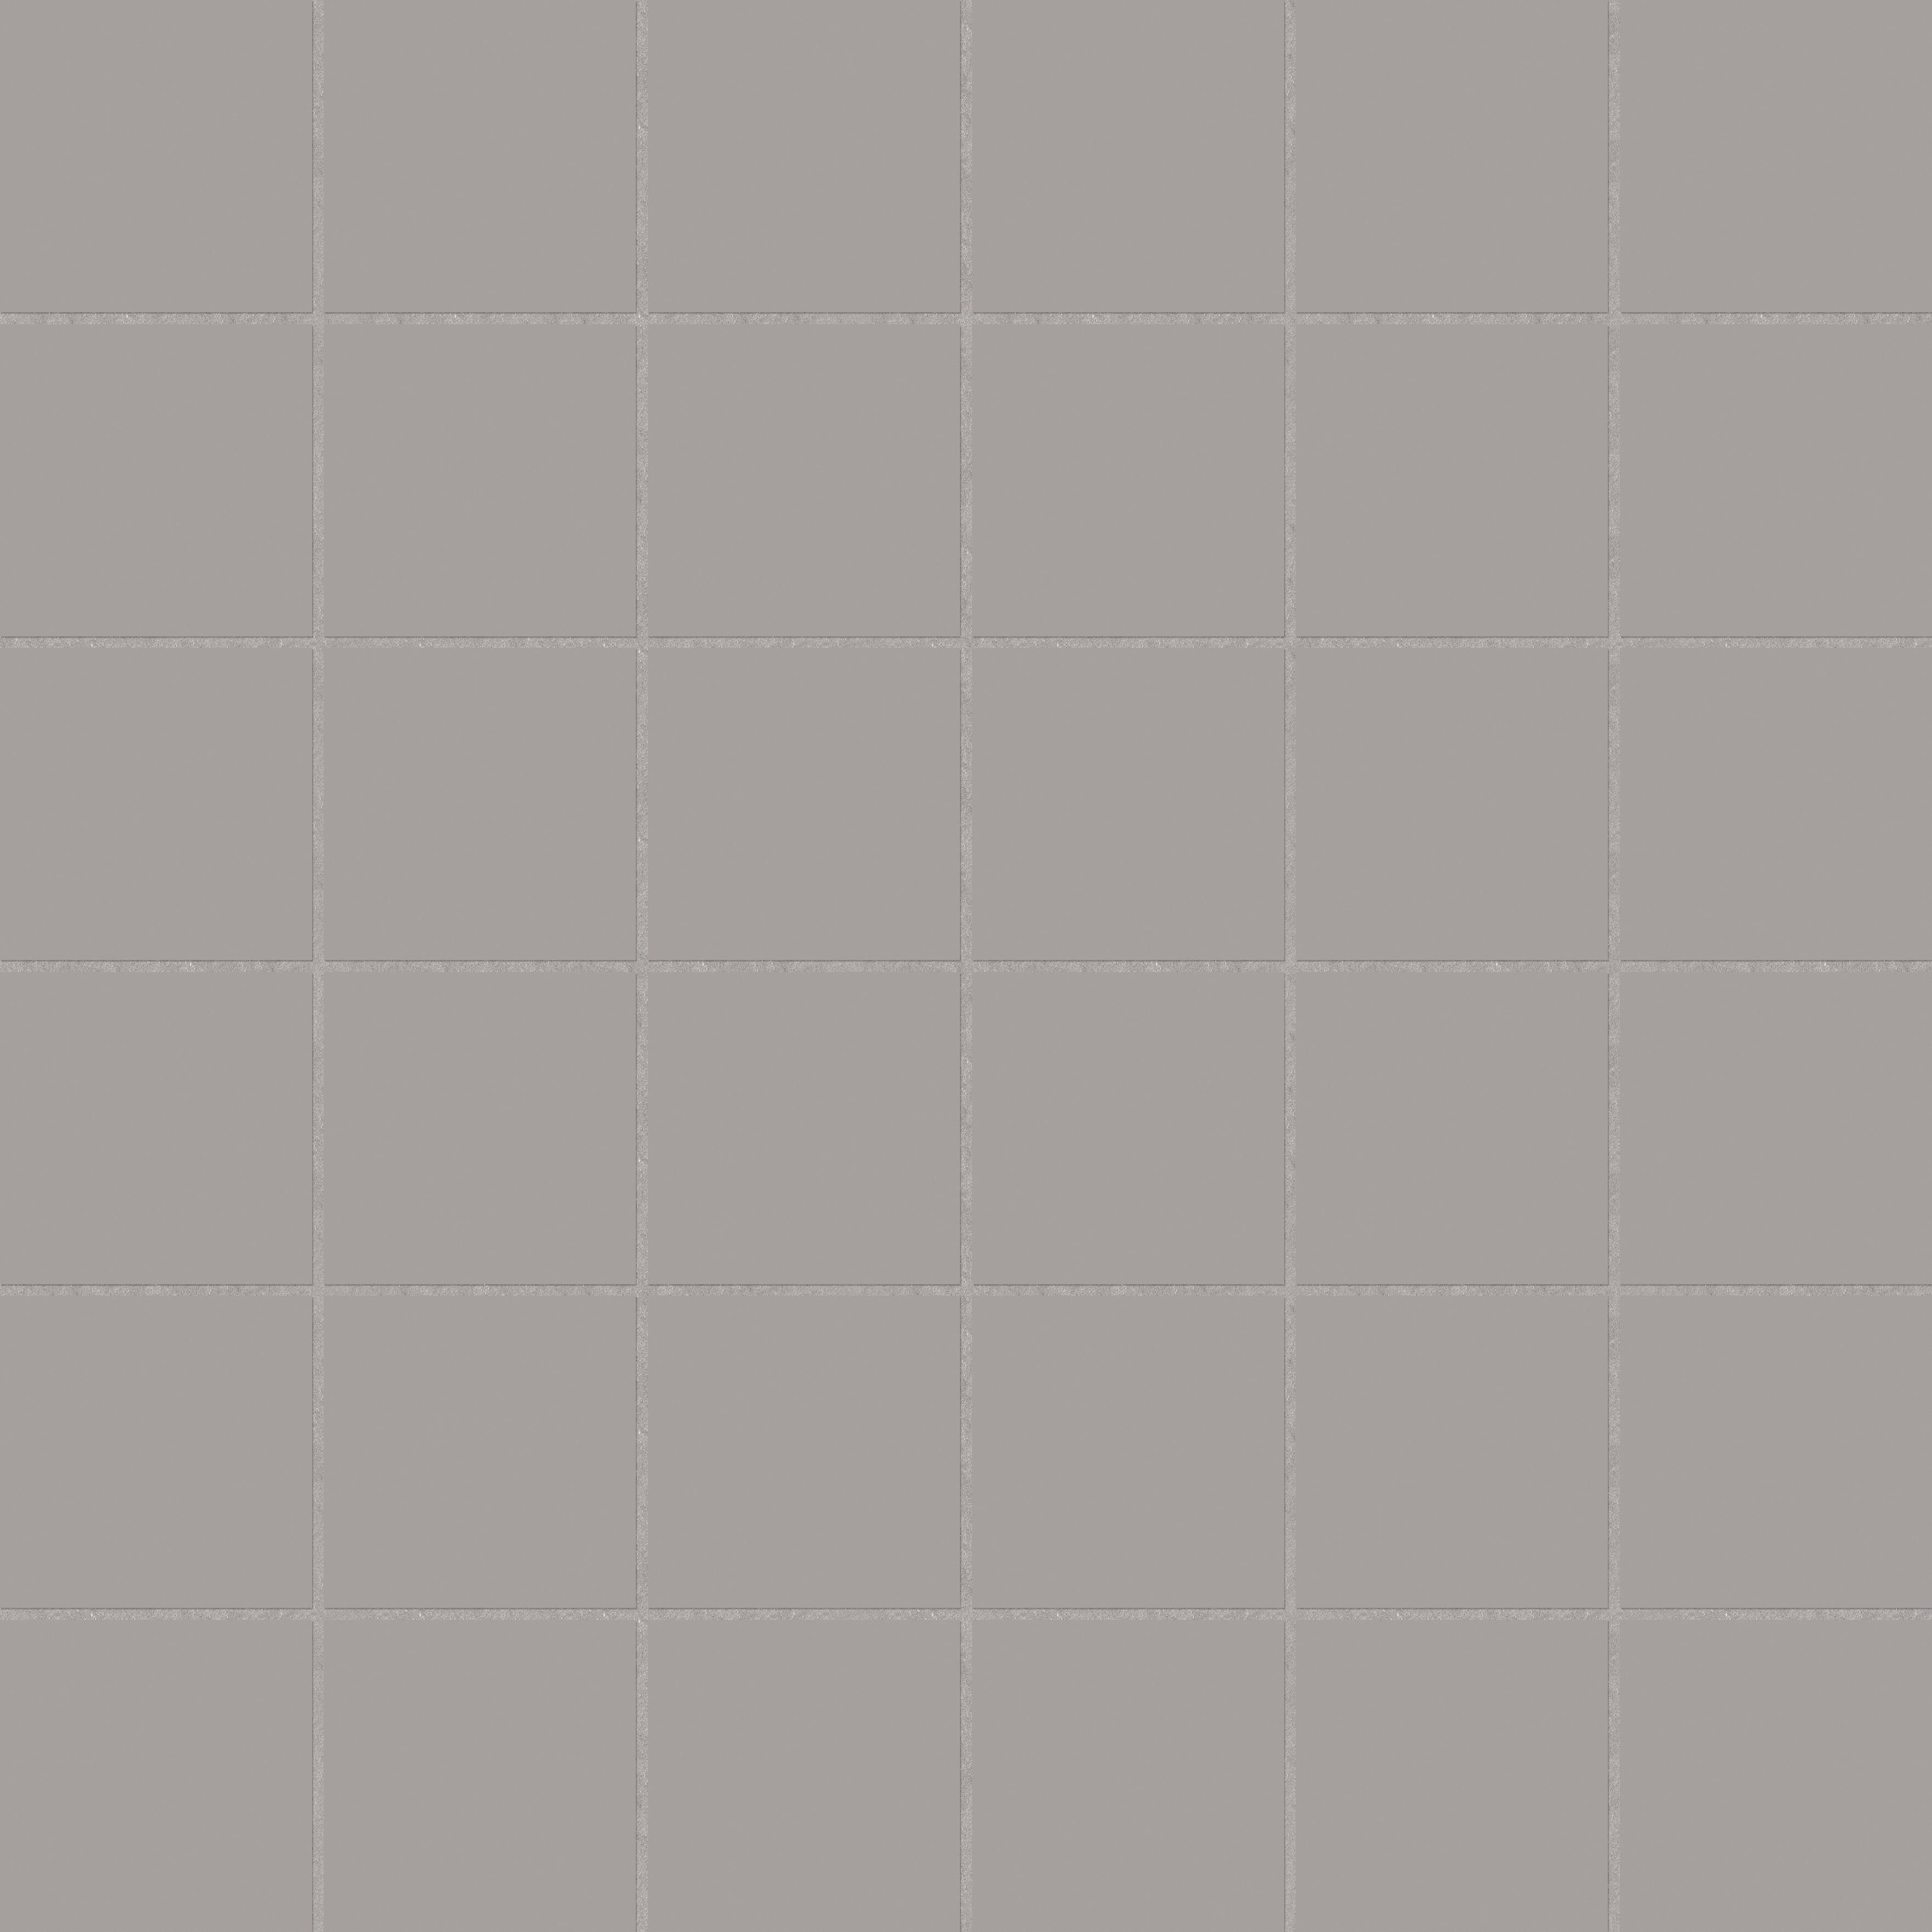 Cute 12 X 12 Ceiling Tile Thin 24X24 Floor Tile Regular 2X8 Subway Tile 3X6 Subway Tile White Old 4X4 White Ceramic Tile Dark704A Armstrong Ceiling Tile Taupe 2x2 Mosaic | #mosaic #taupe #Soho #ceramic #MidAmericaTile ..